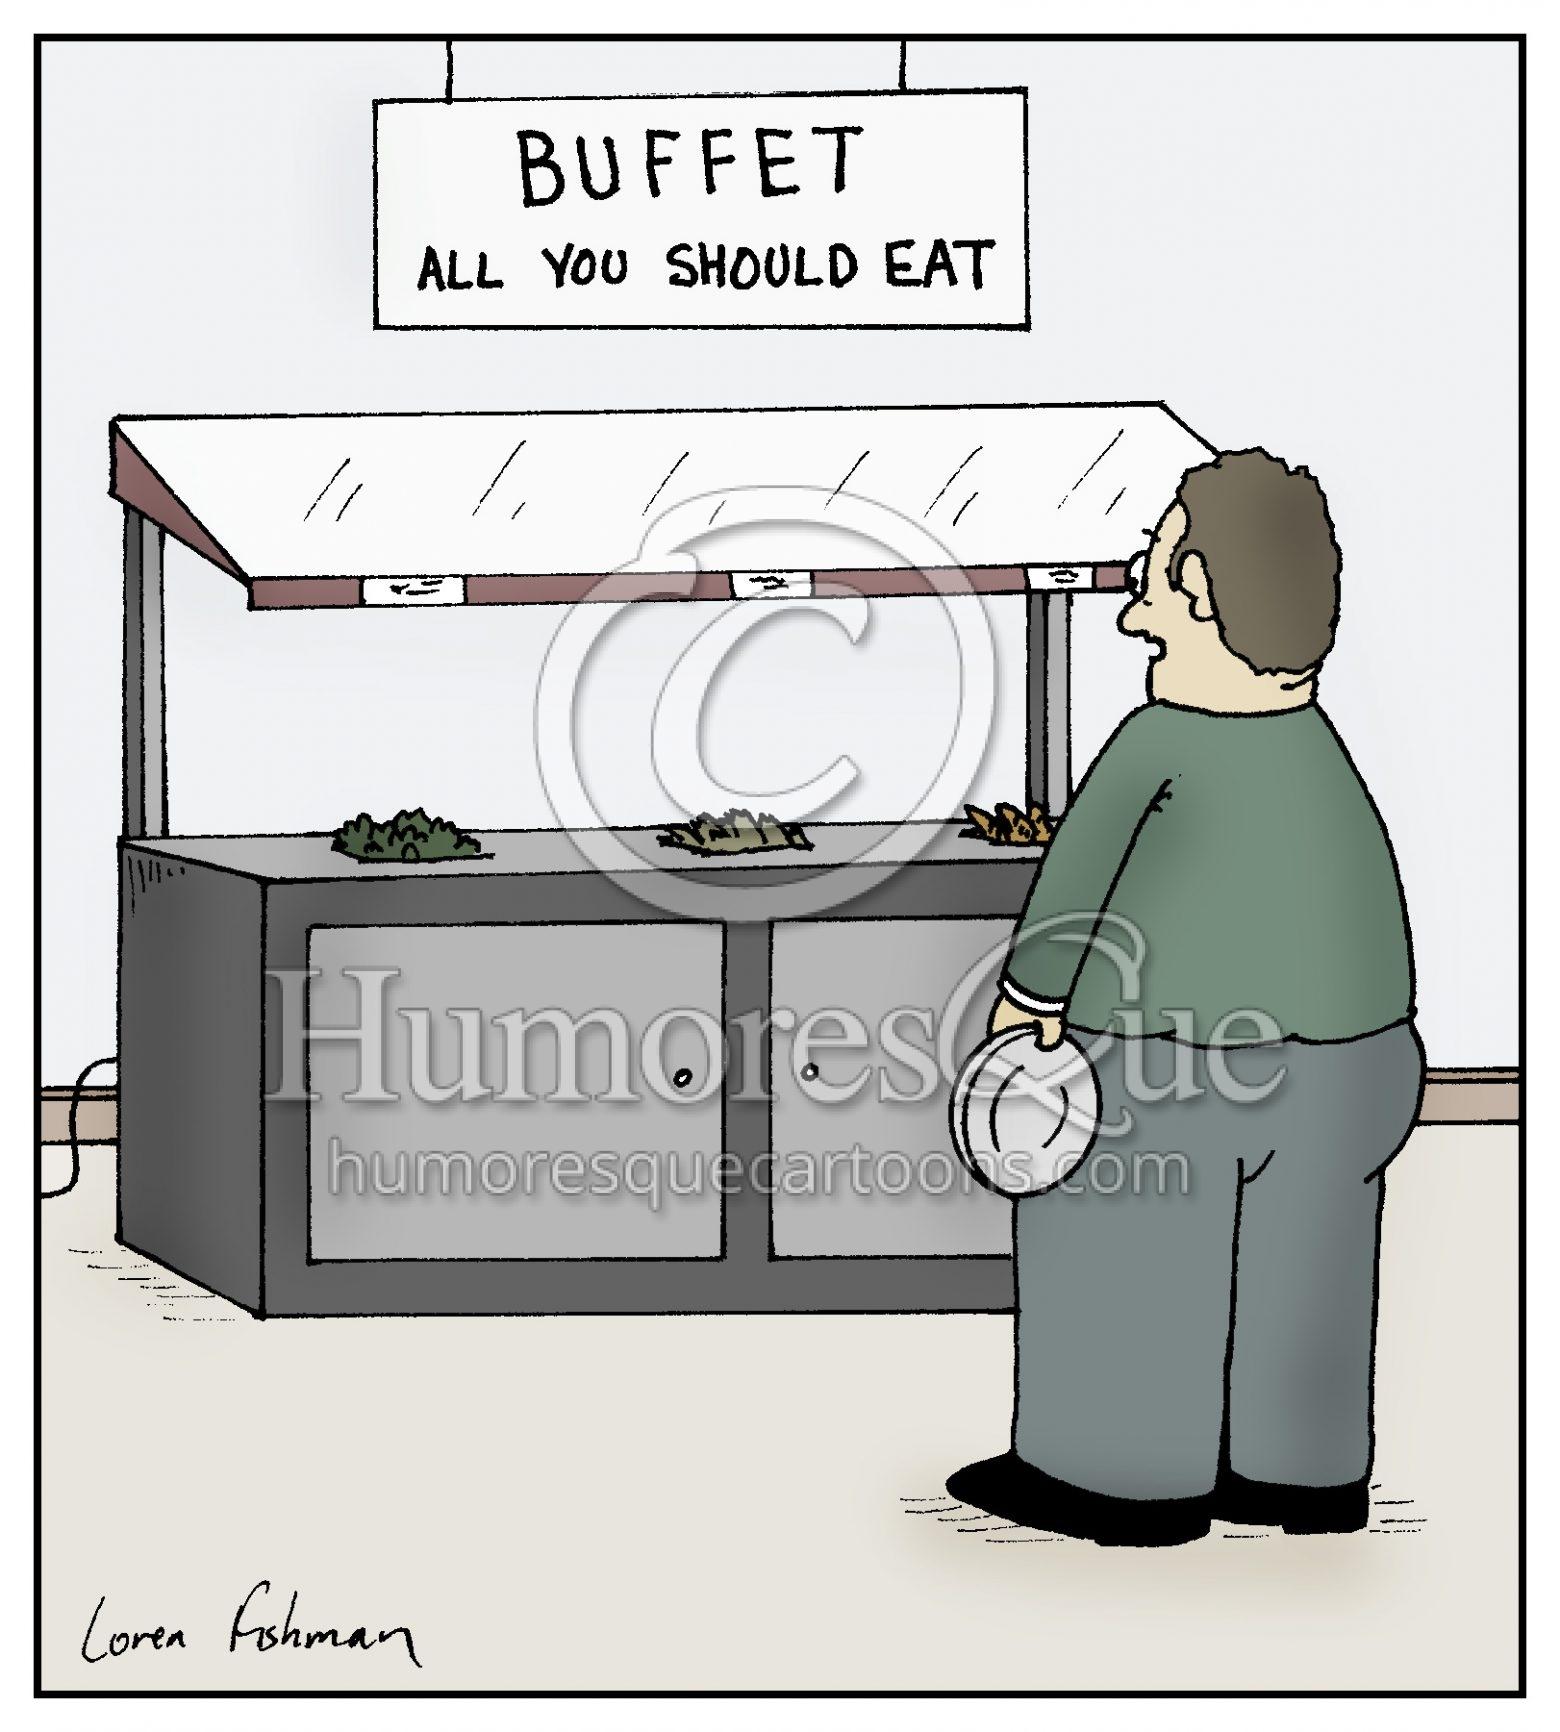 buffet overweight and obesity cartoon